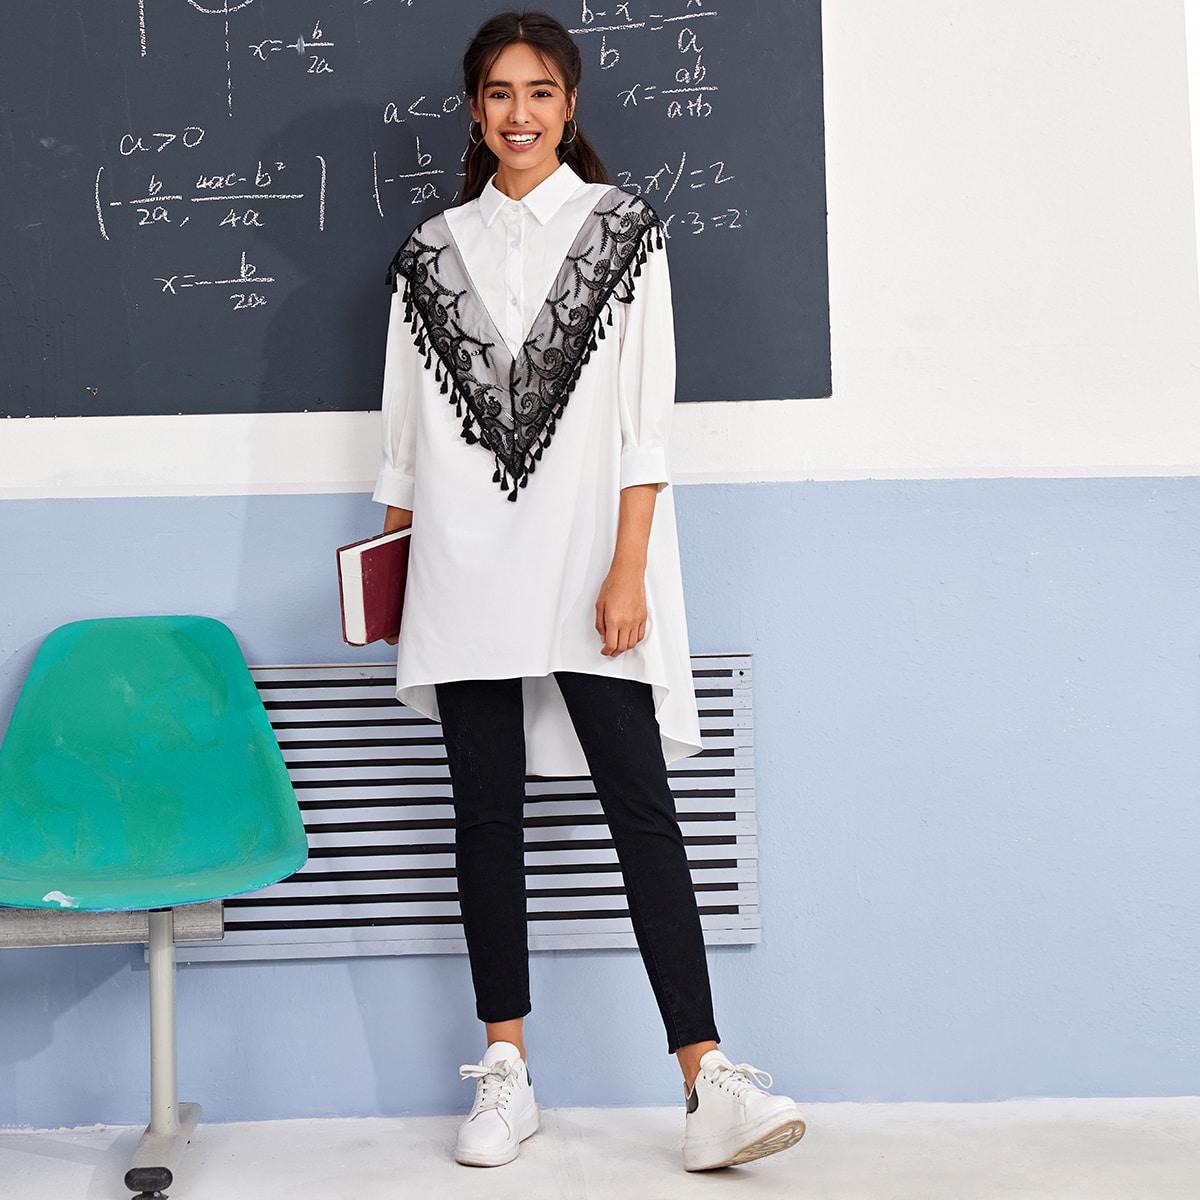 SHEIN / Camisa ribete con fleco con malla con bordado en contraste